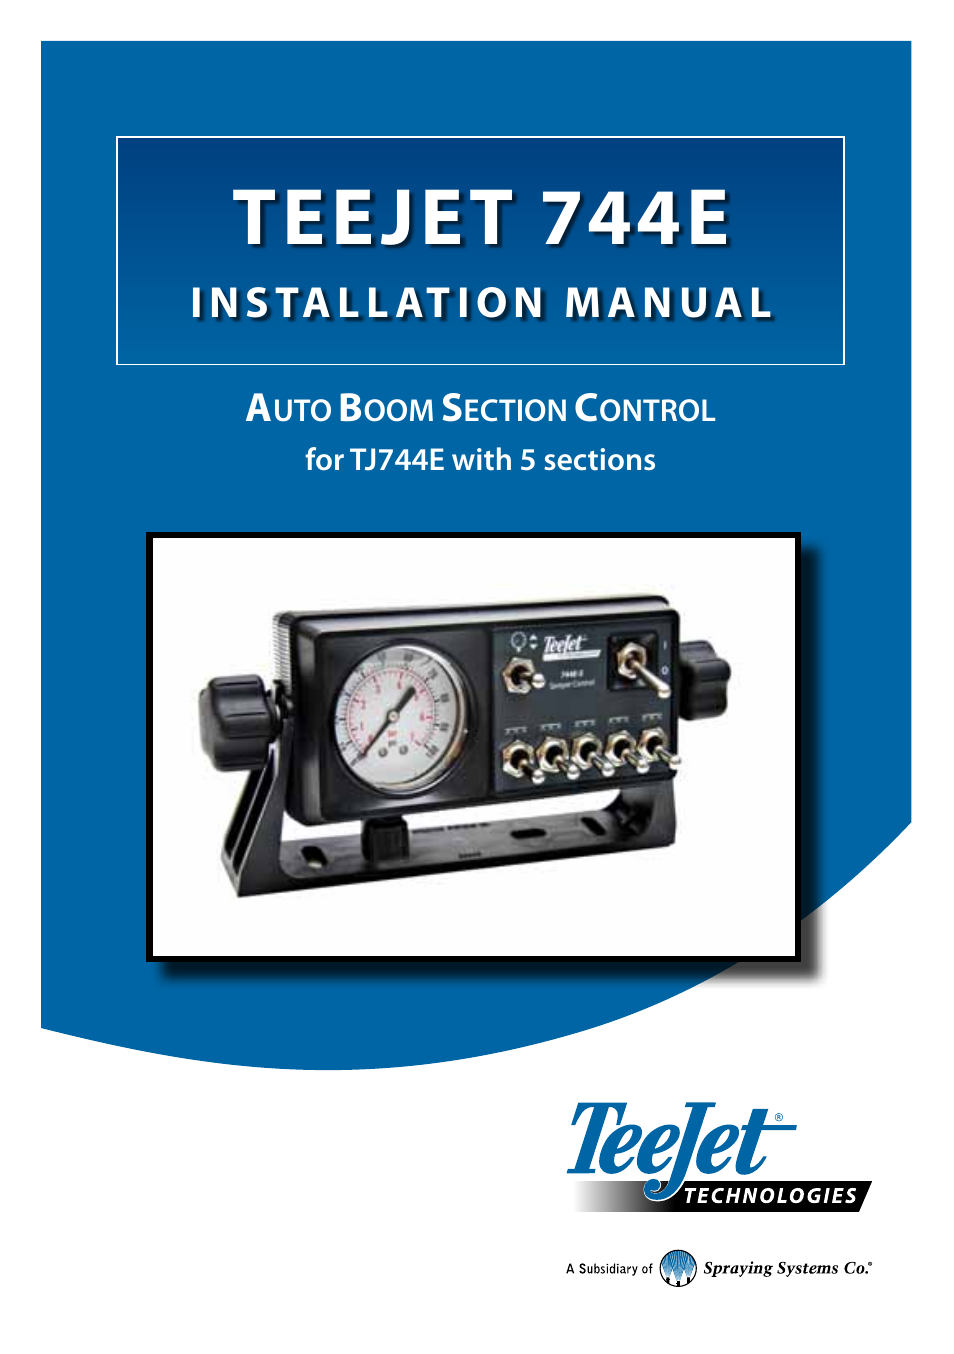 teejet 744e auto boom section control user manual